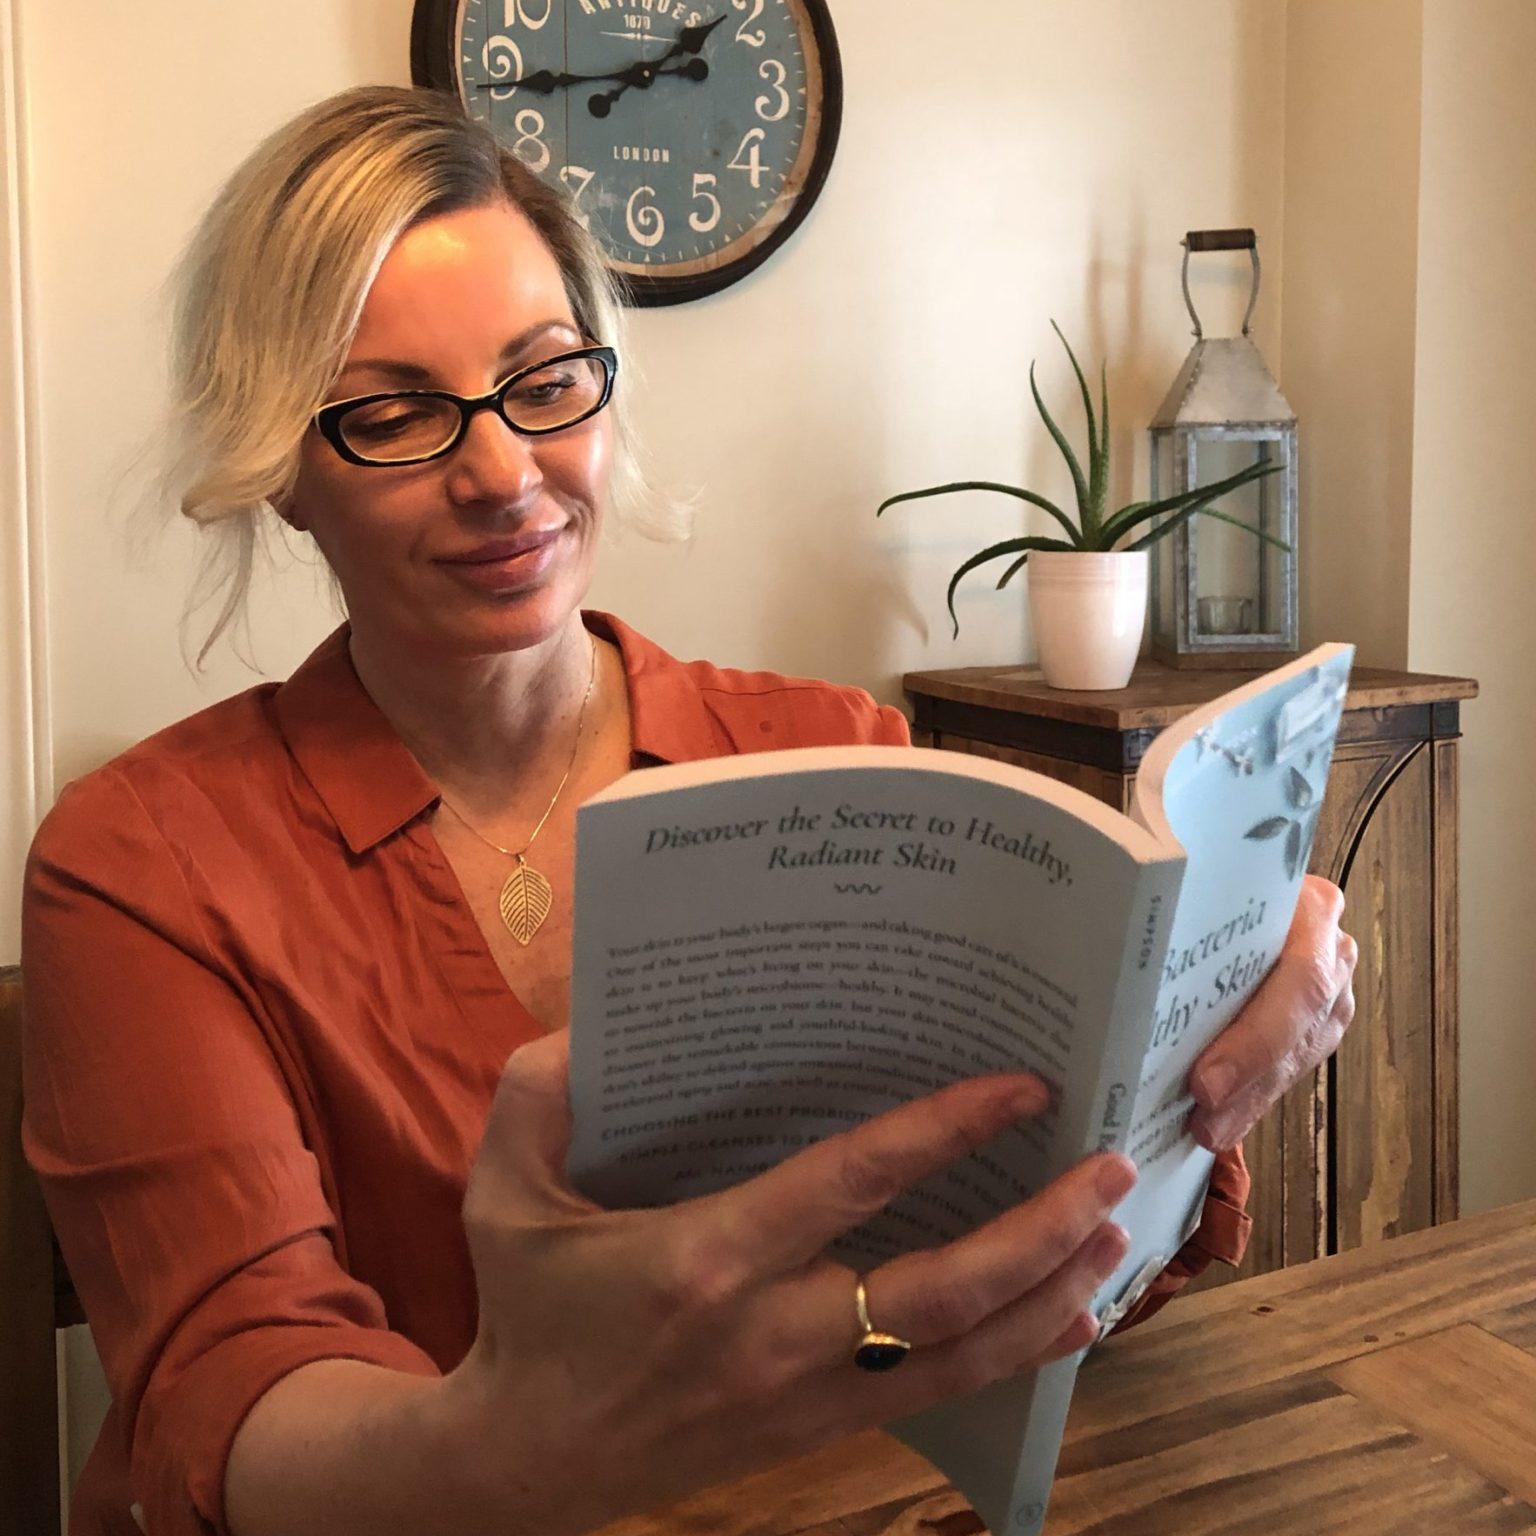 Paula seating, reading Good Bacteria for Healthy Skin.